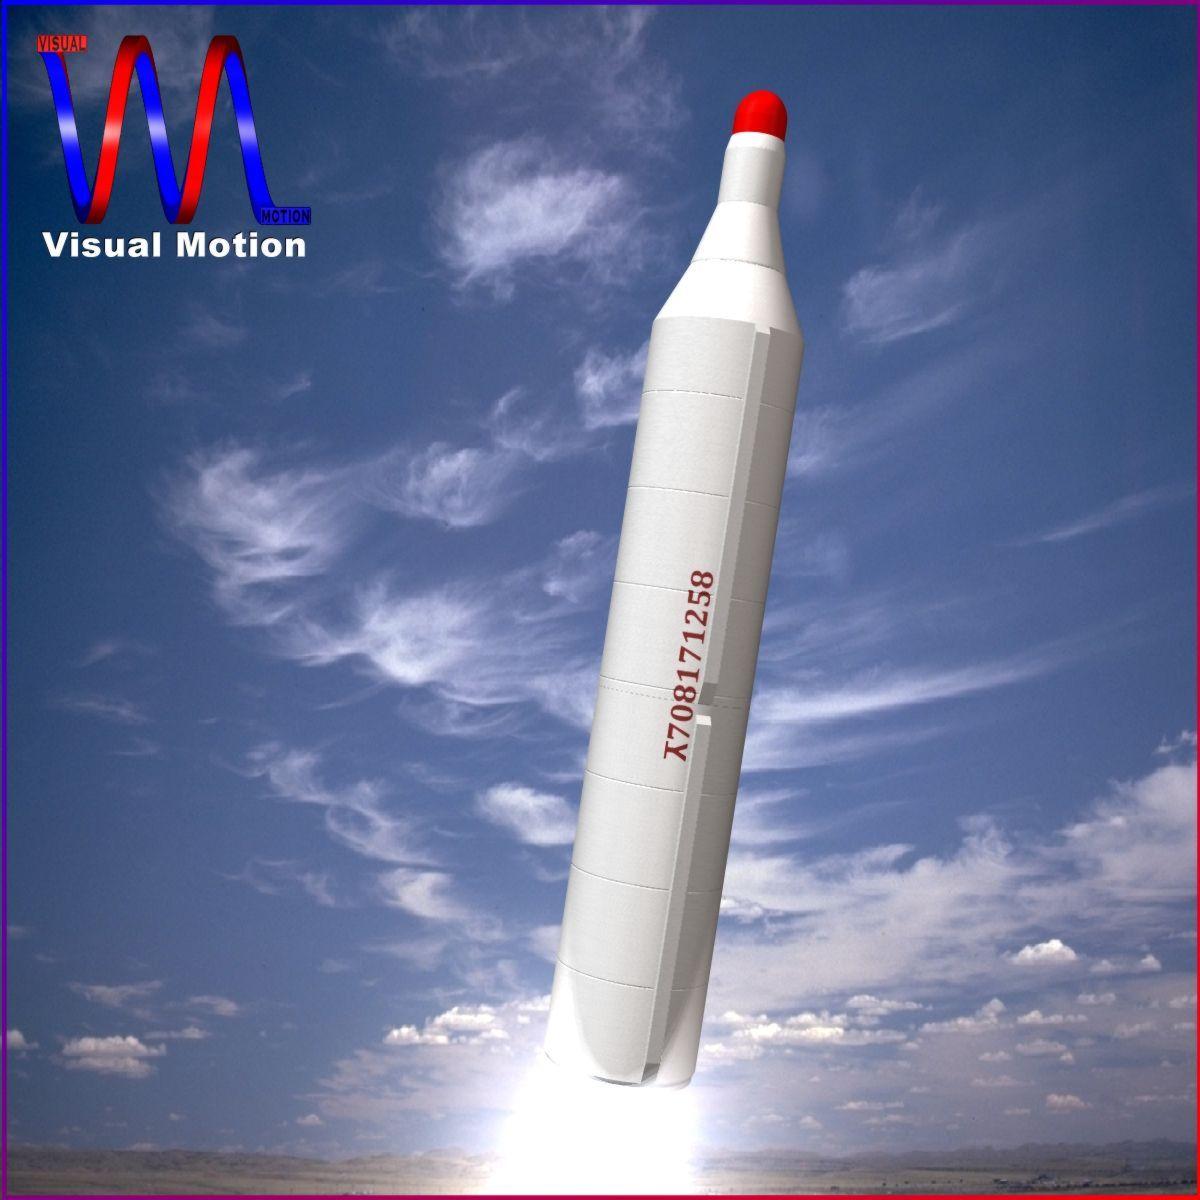 dprk bm25 musudan 2 scenska raketa 3d model 3ds dxf cob x obj 152797